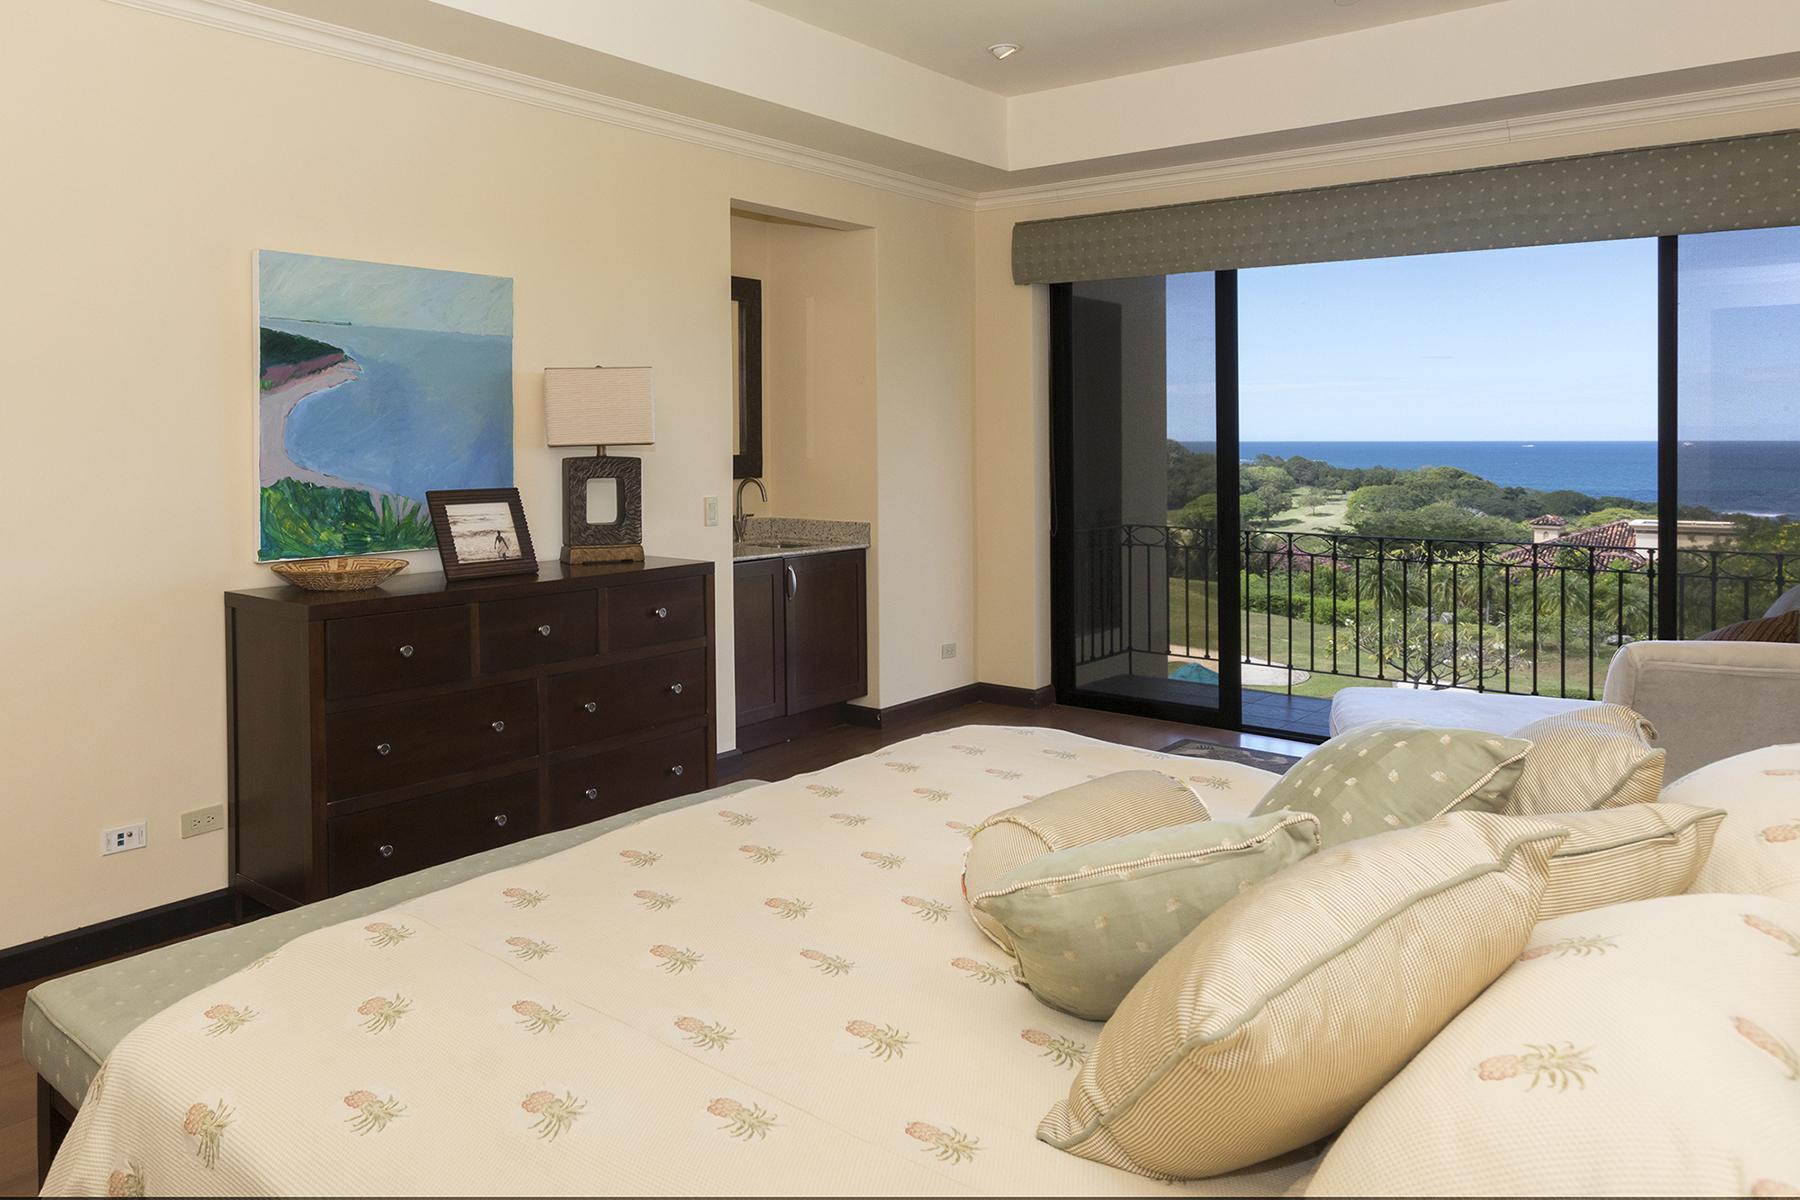 malinche_321B_master_bedroom